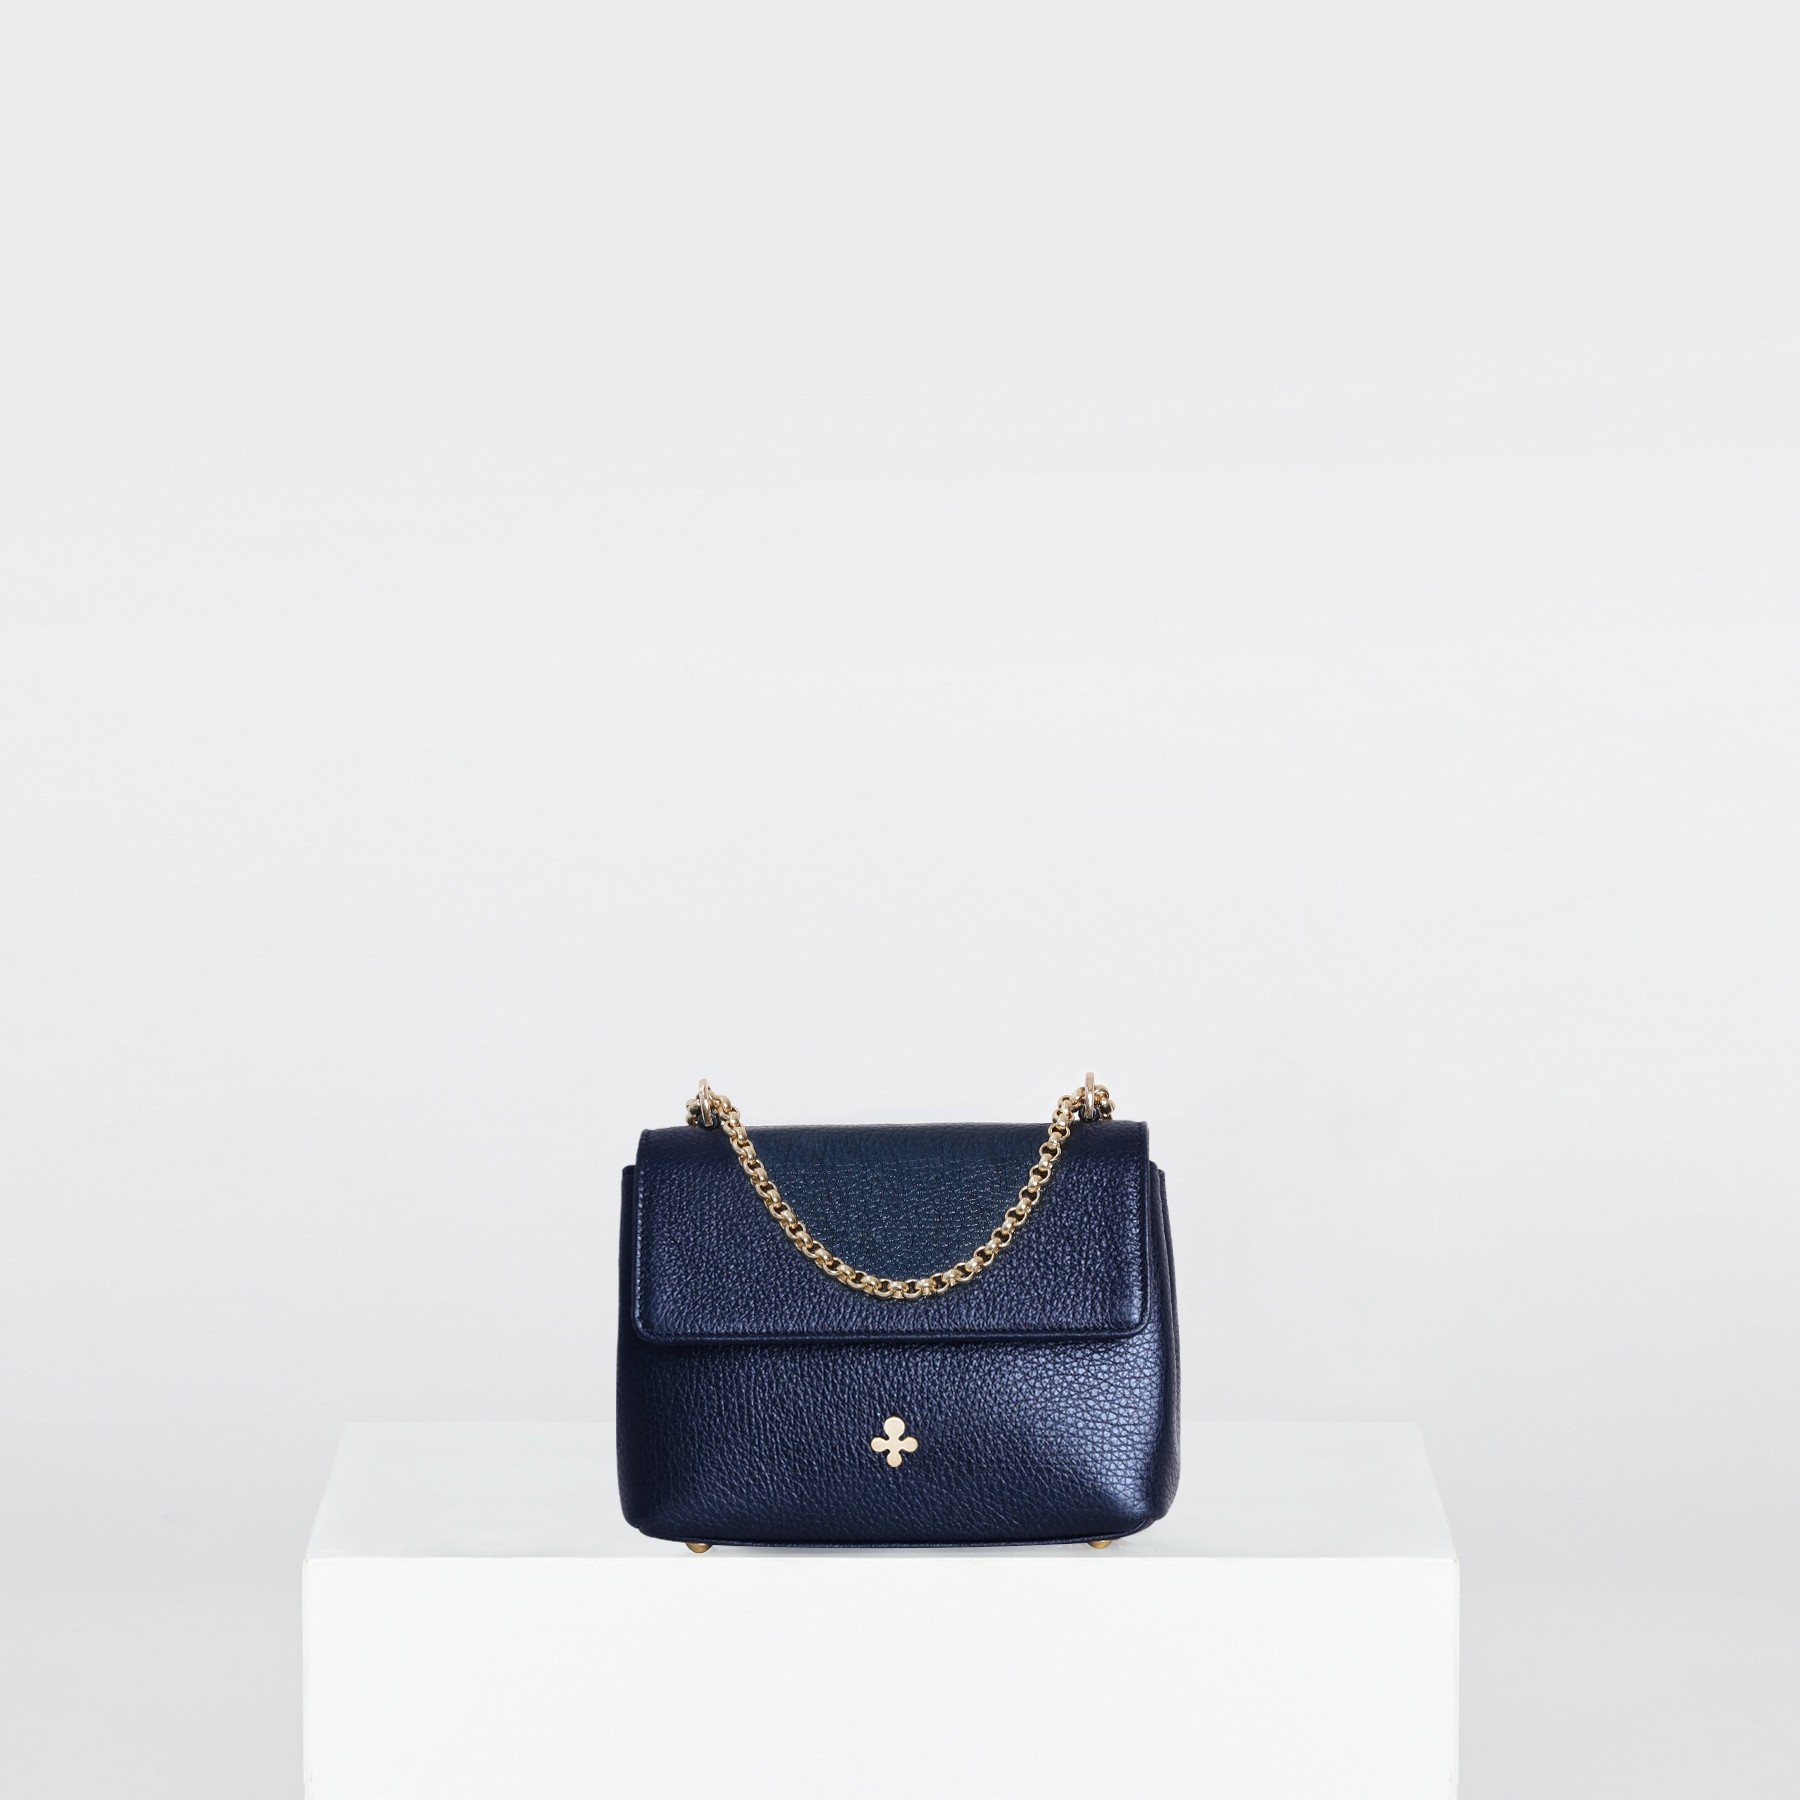 Mini sac ZOE, bleu métallique